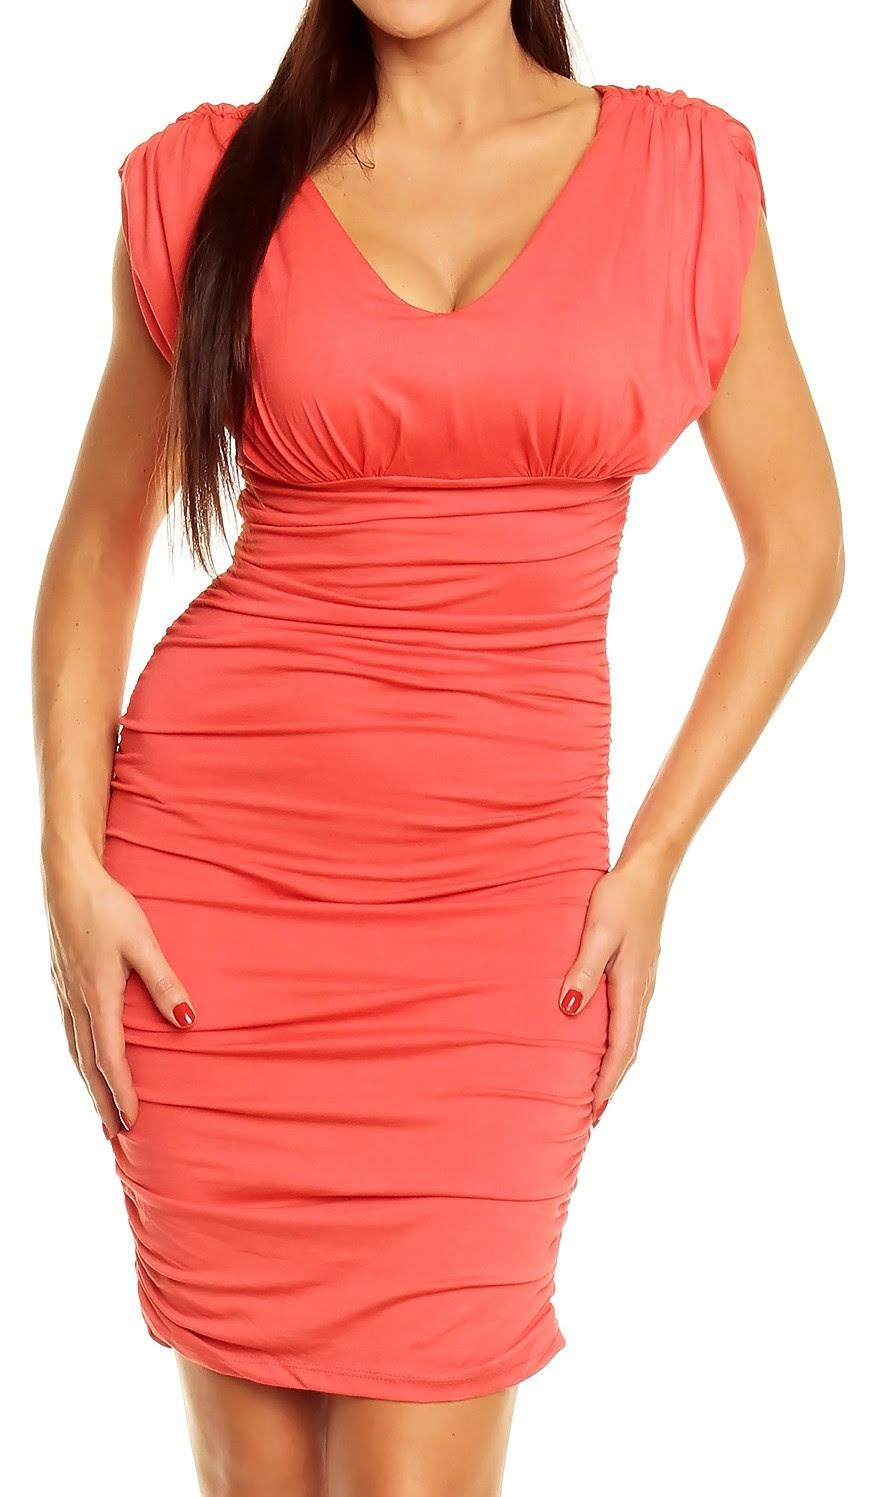 Bodycon dress online shop